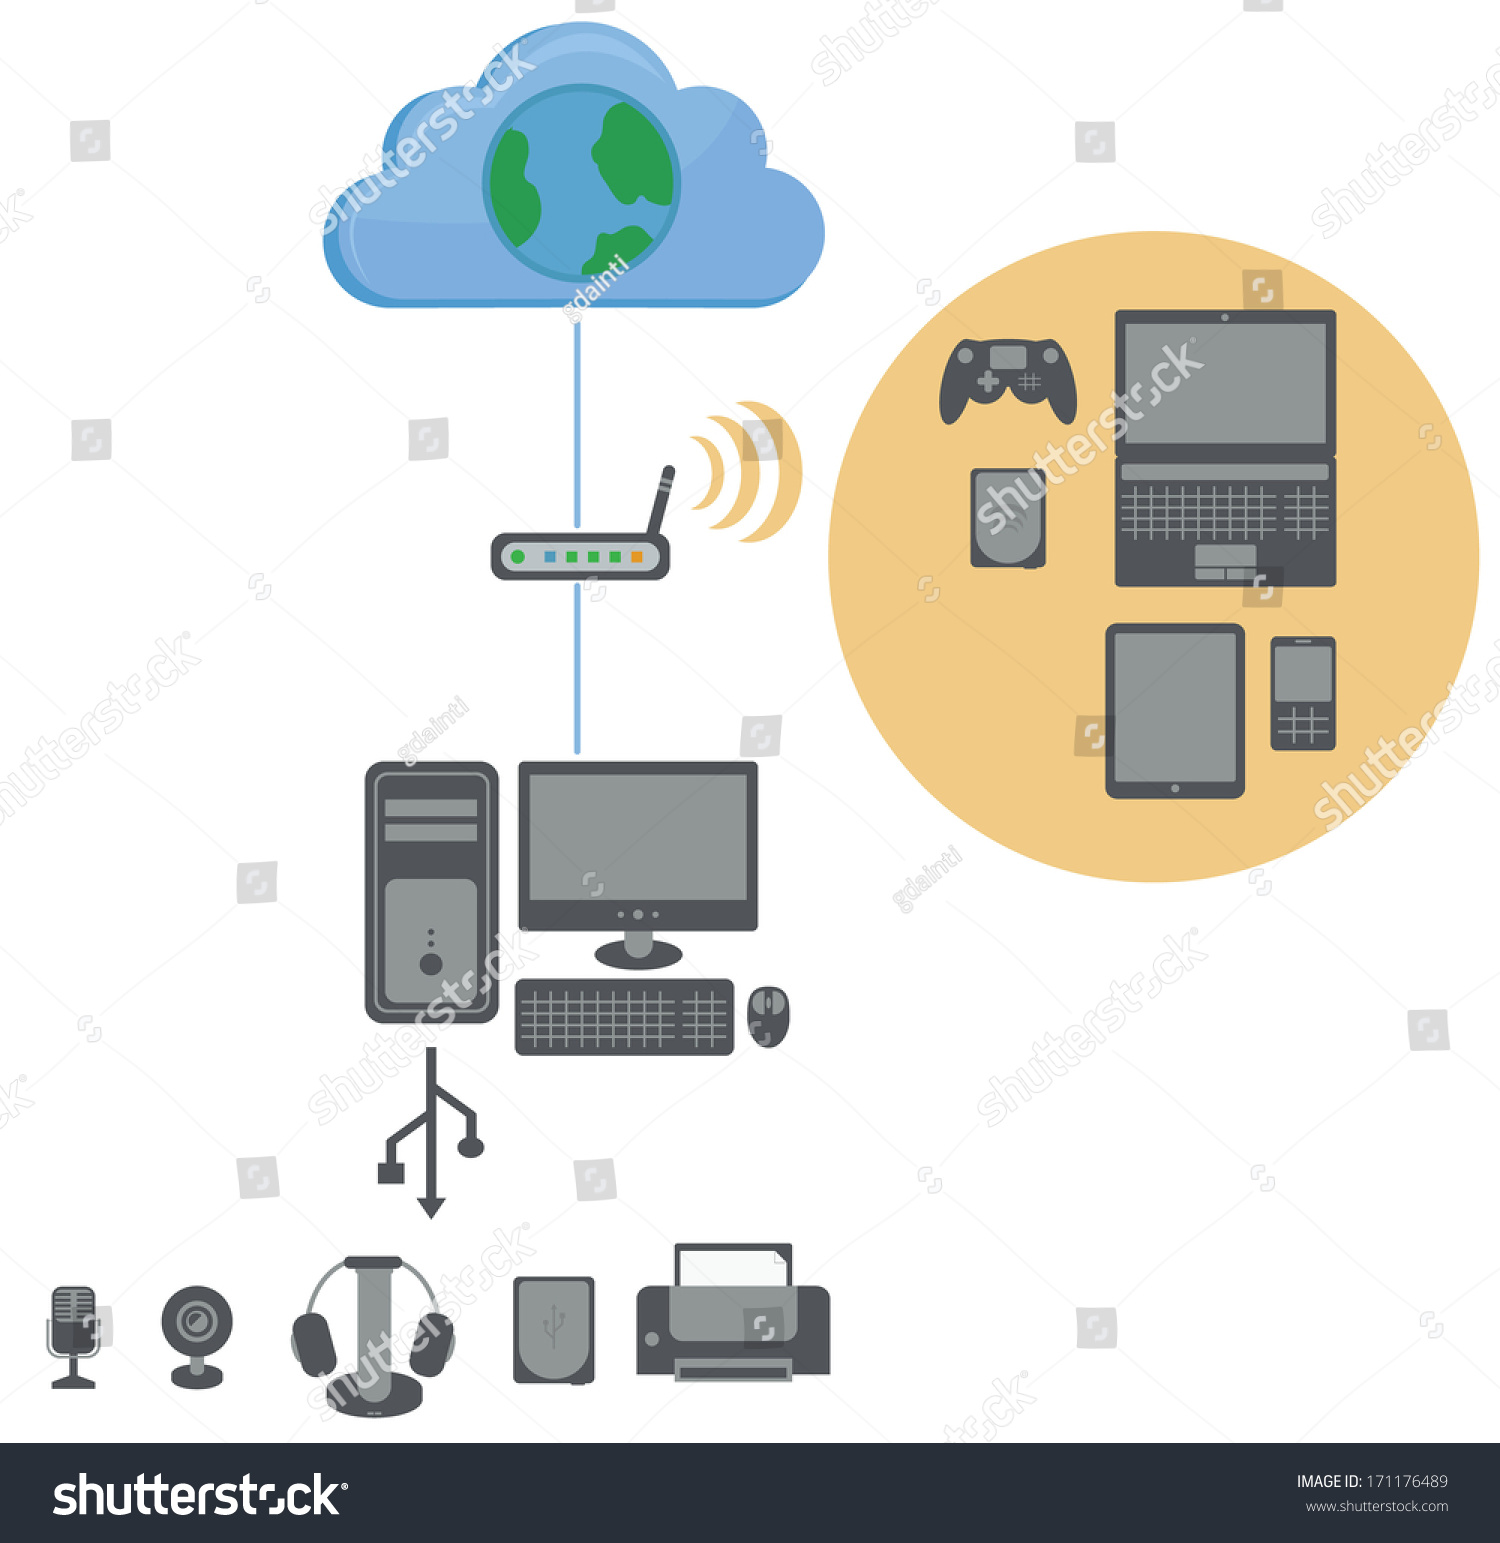 fios router wiring diagram renault clio 2 radio verizon work interface device directv genie